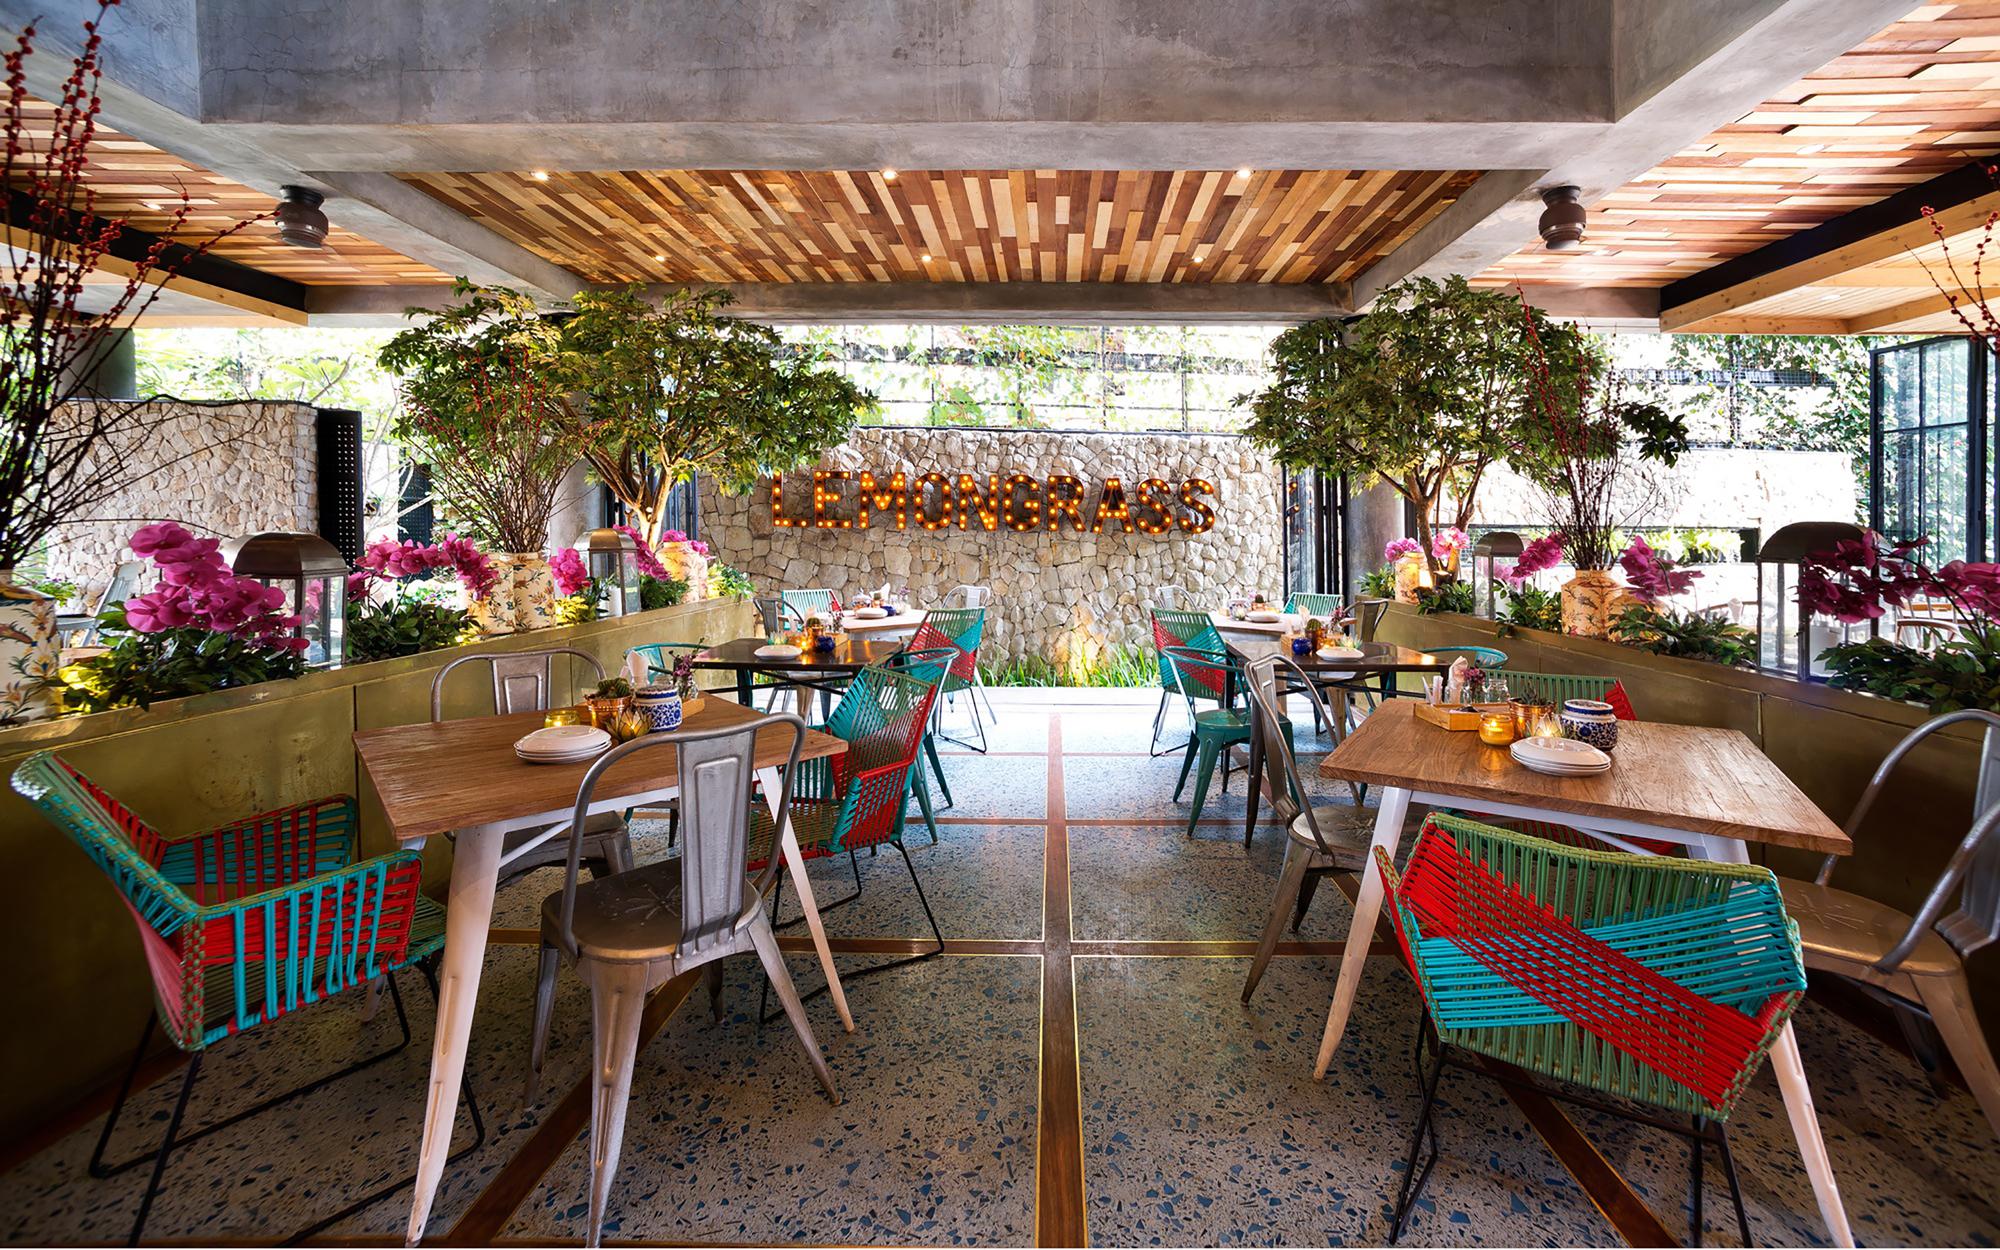 Galeria de restaurante lemongrass einstein associates